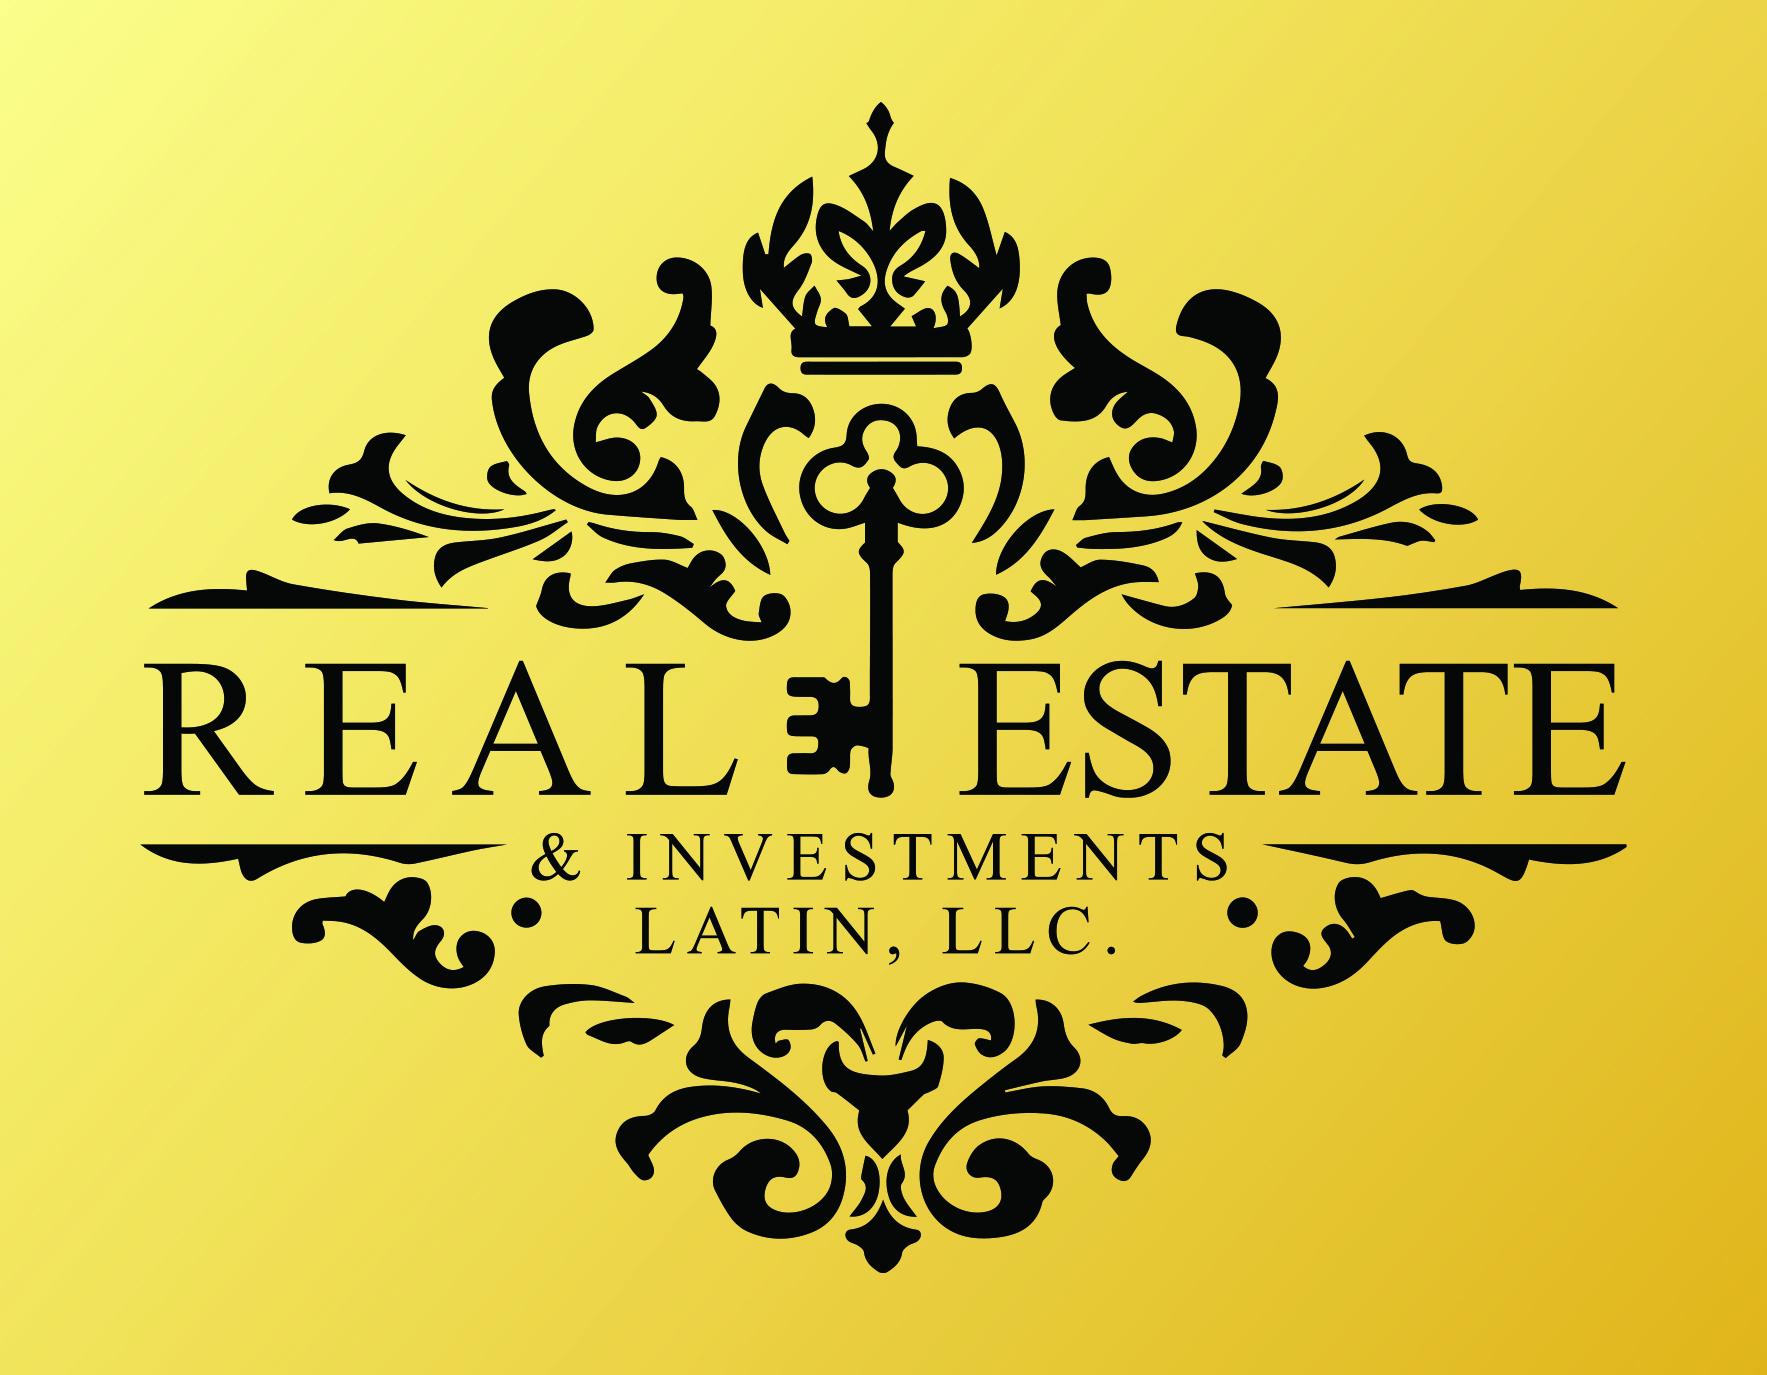 Real Estate Investments Latin, LLC